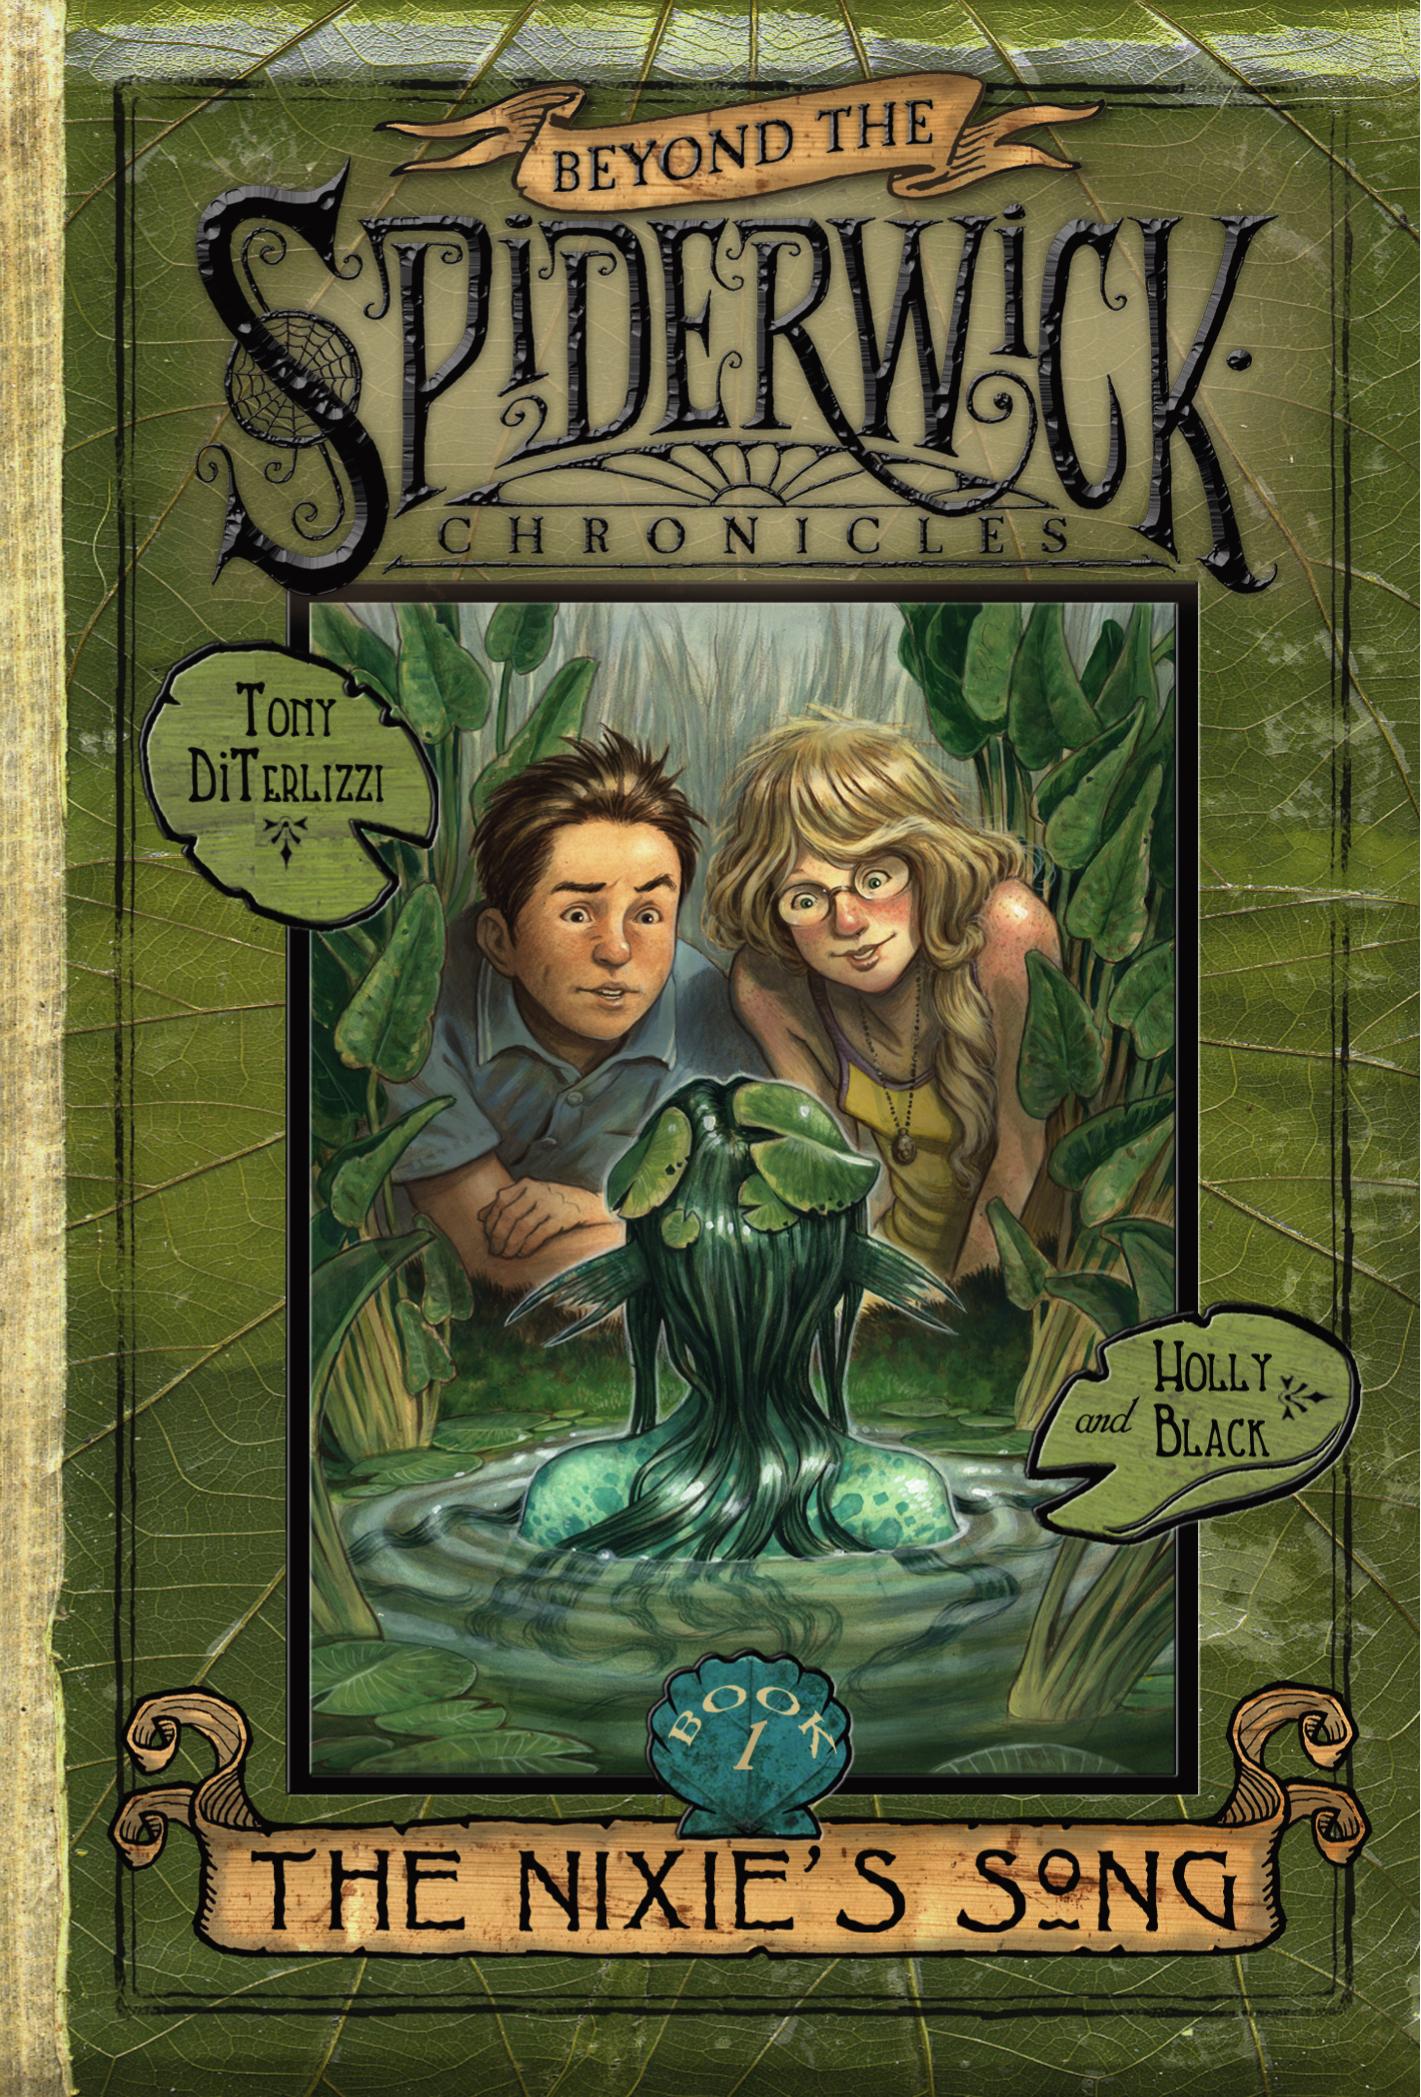 holly-black-beyond-spiderwick-chronicles.jpg